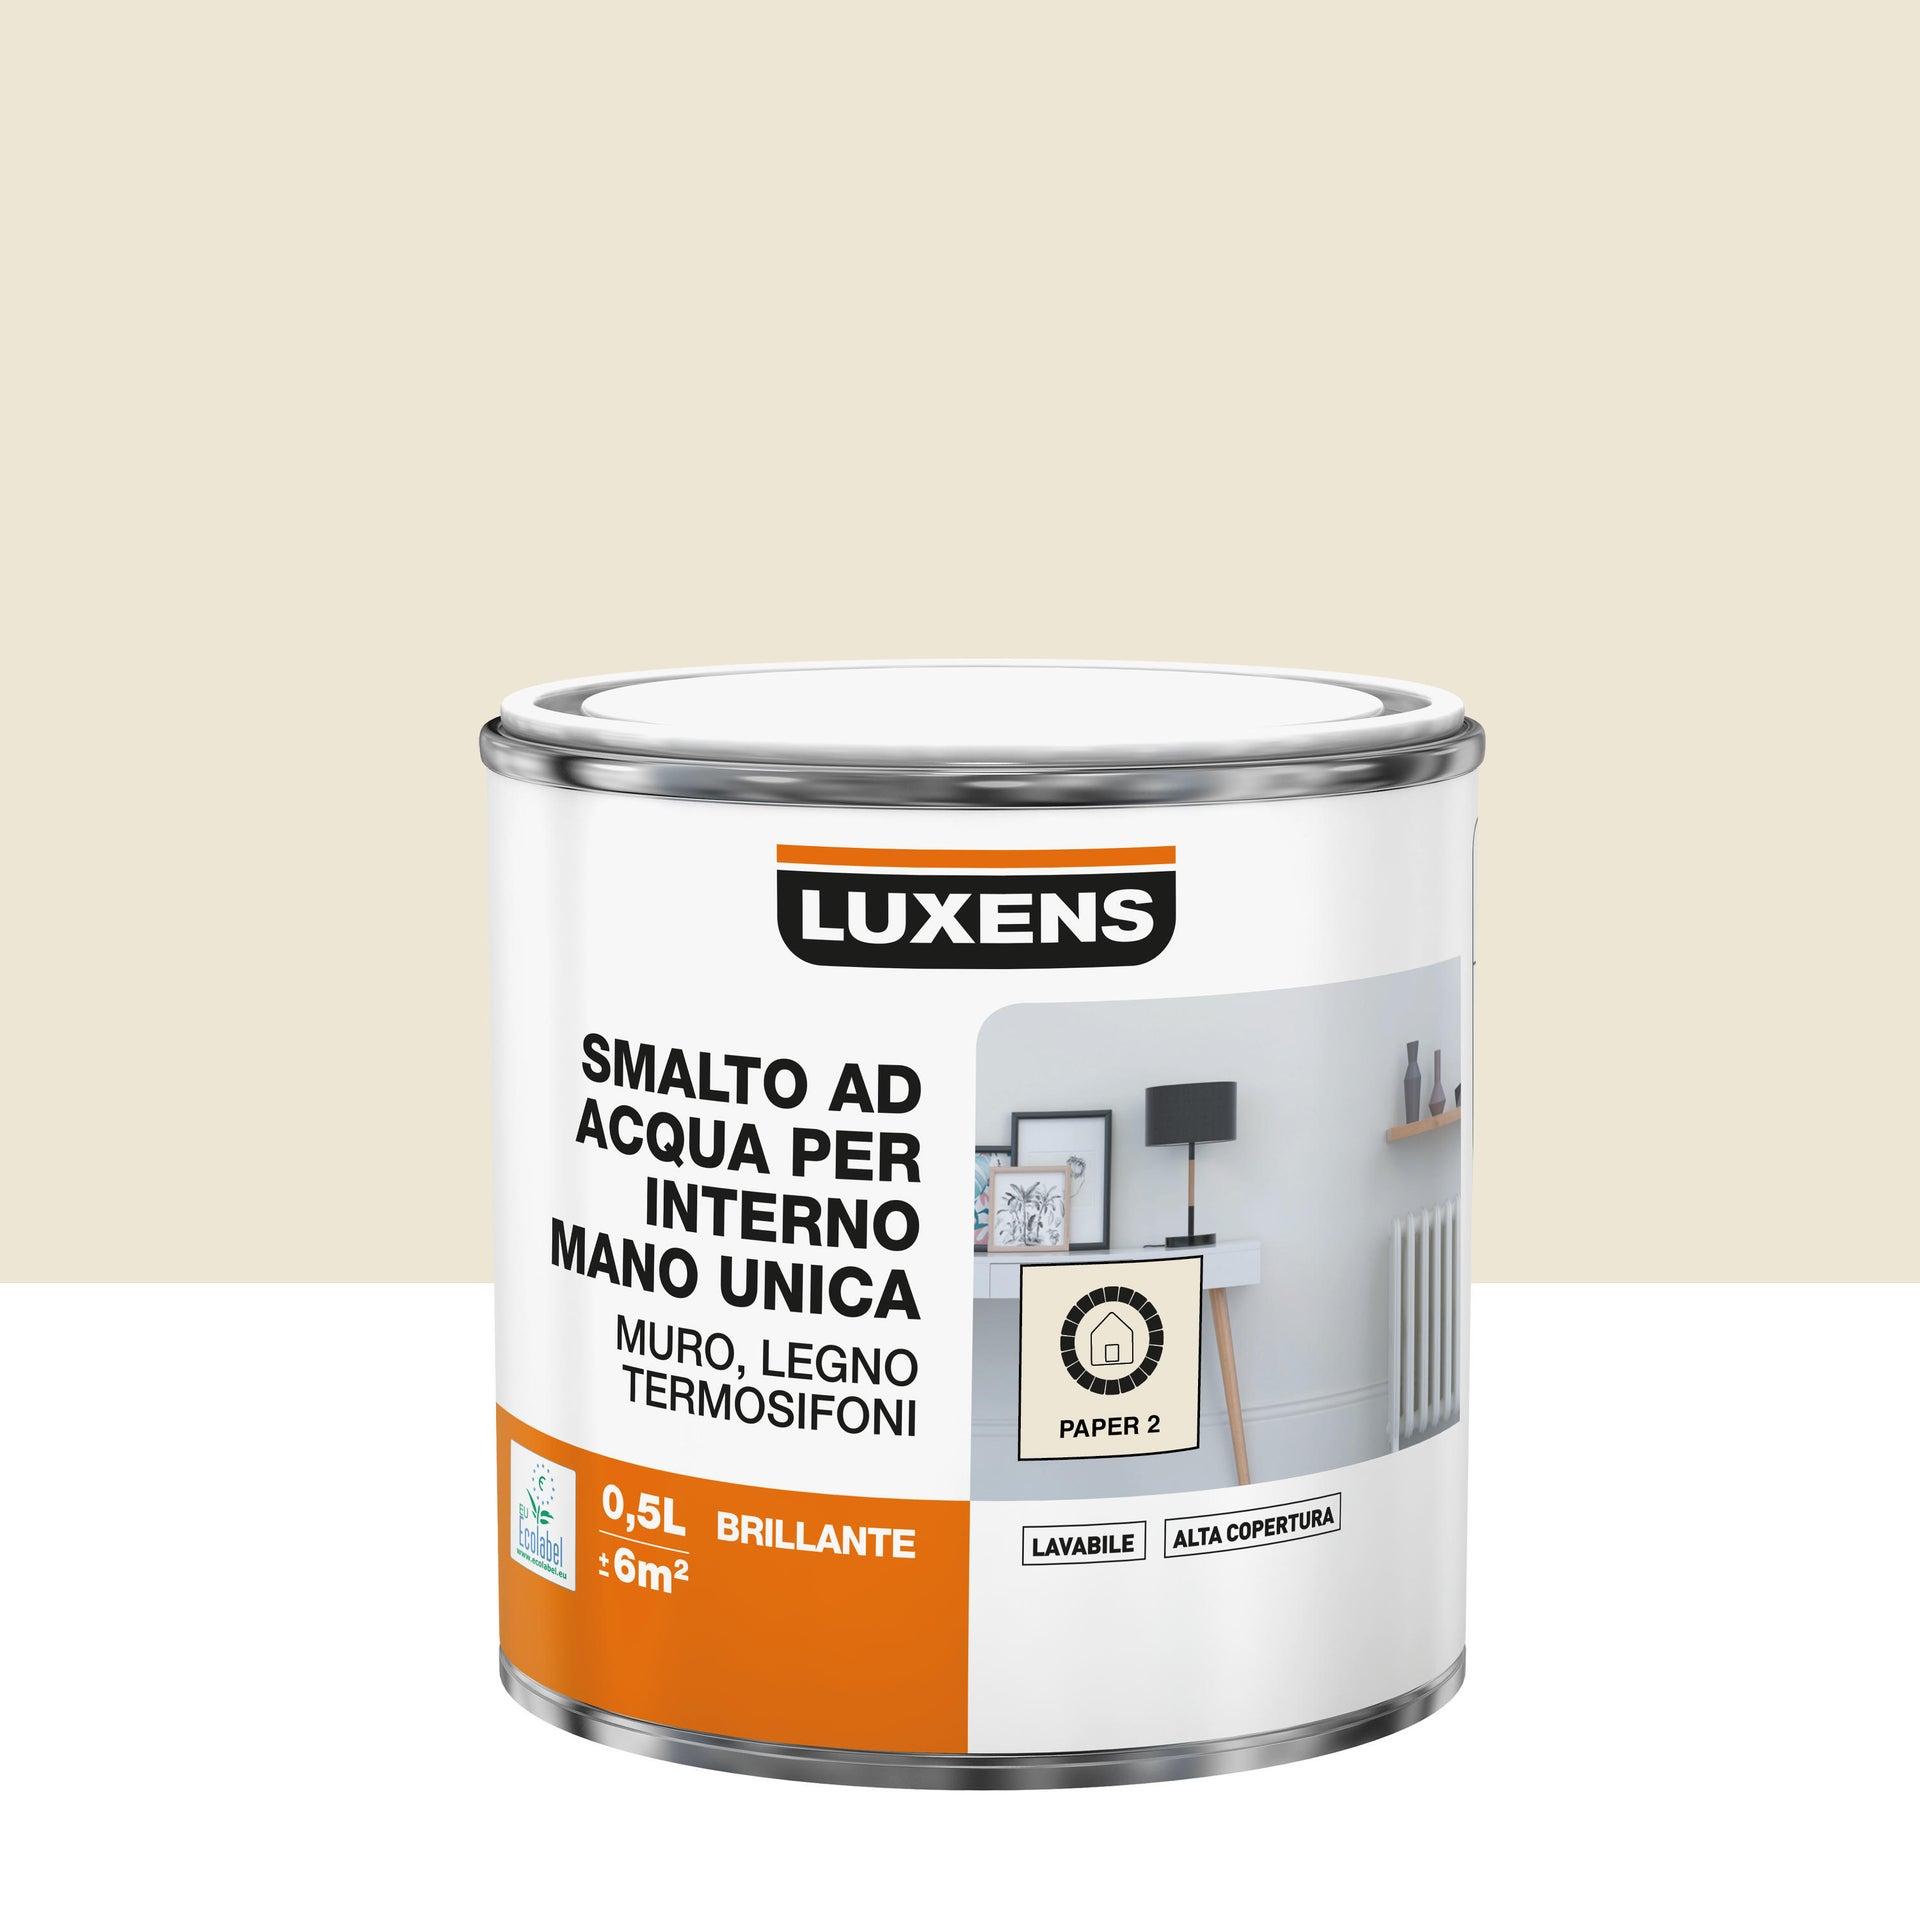 Vernice di finitura LUXENS Manounica base acqua bianco paper 2 lucido 0.5 L - 3